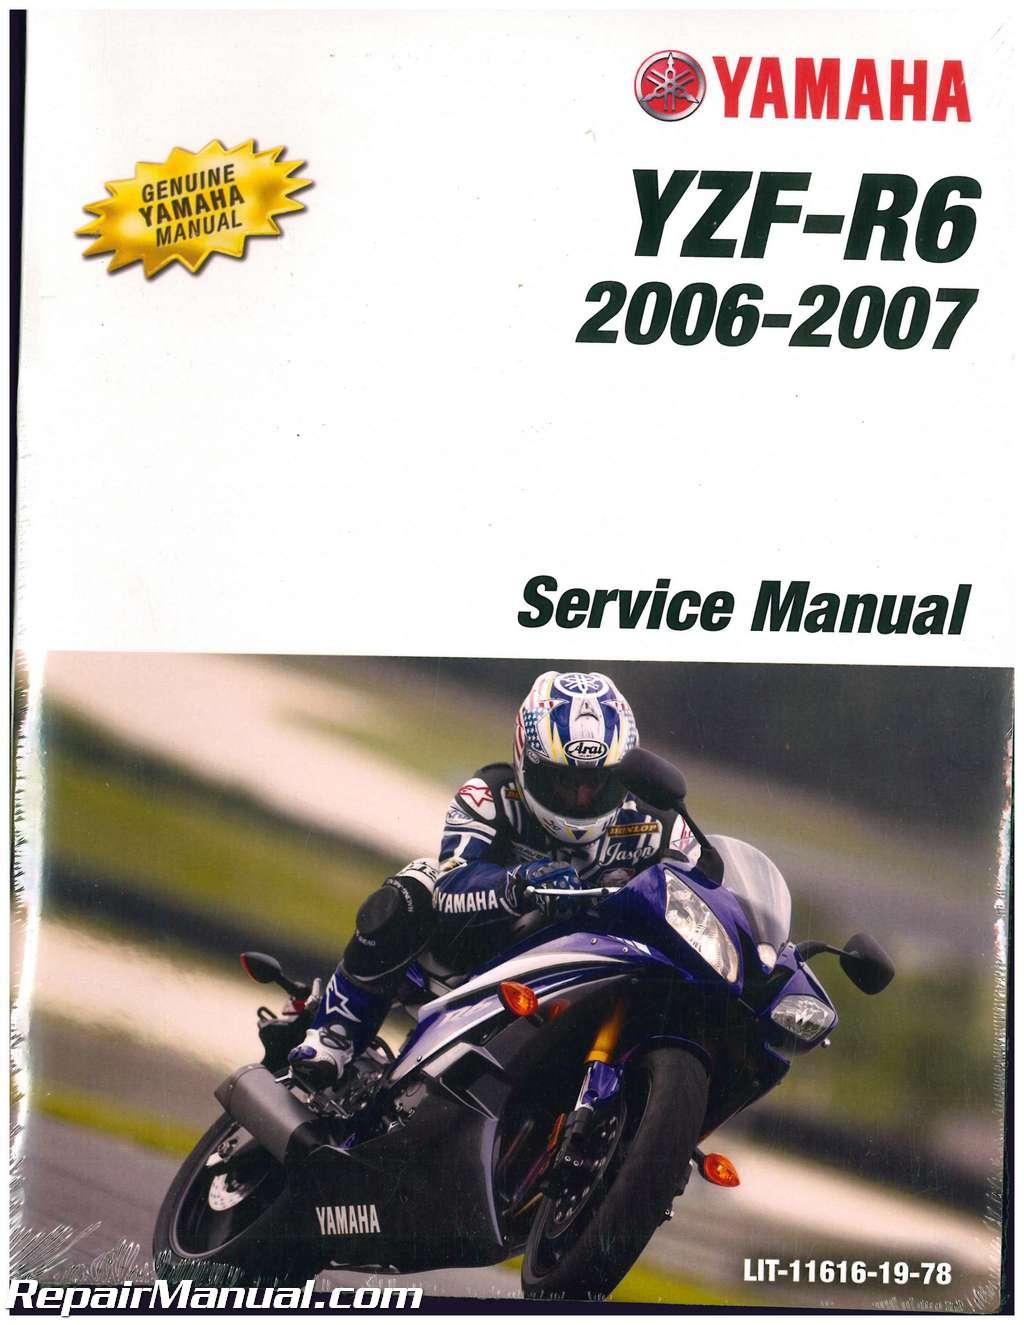 2006 yamaha yzfr6 yzfr6s motorcycle service manual